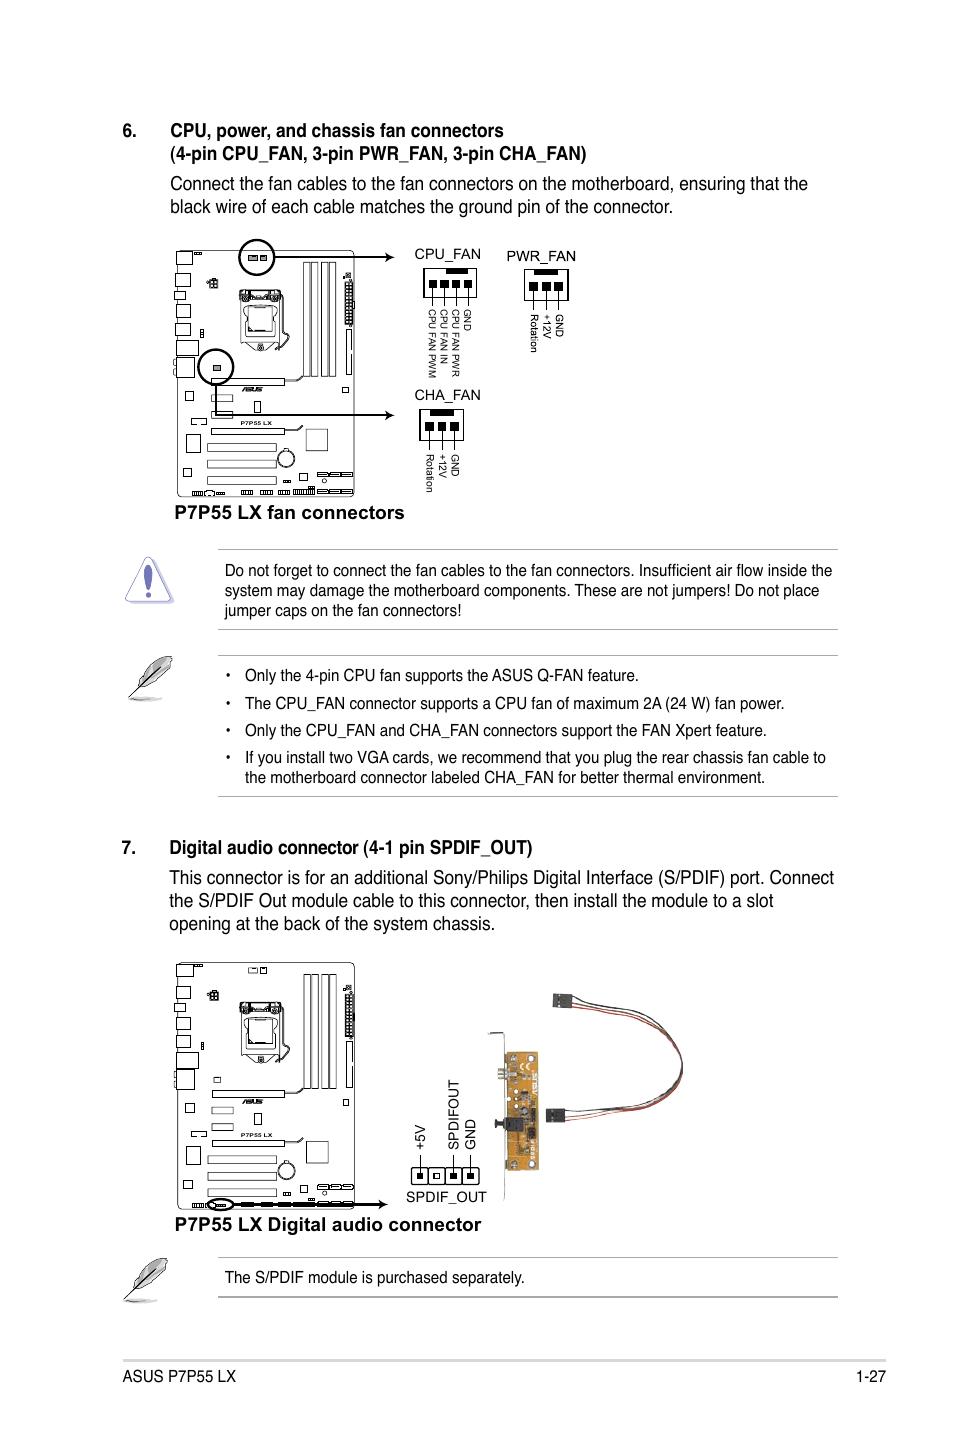 P7p55 Lx Fan Connectors Digital Audio Connector Asus Motherboard Wiring Diagram Jooyon Si User Manual Page 39 70